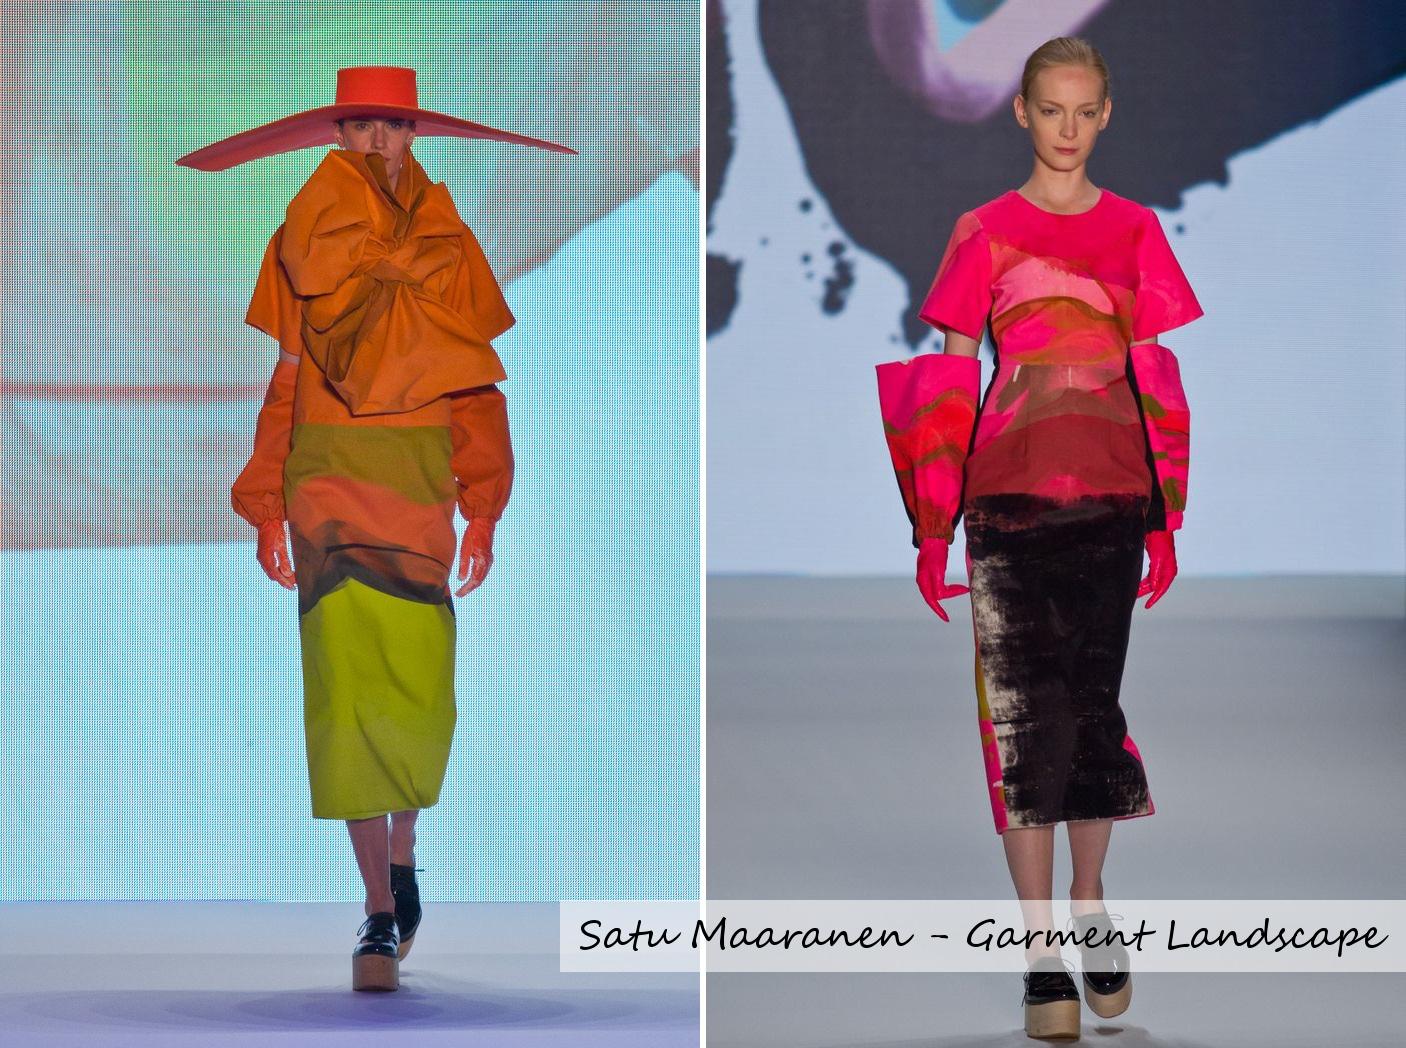 satu maaranen fashionvictress 01